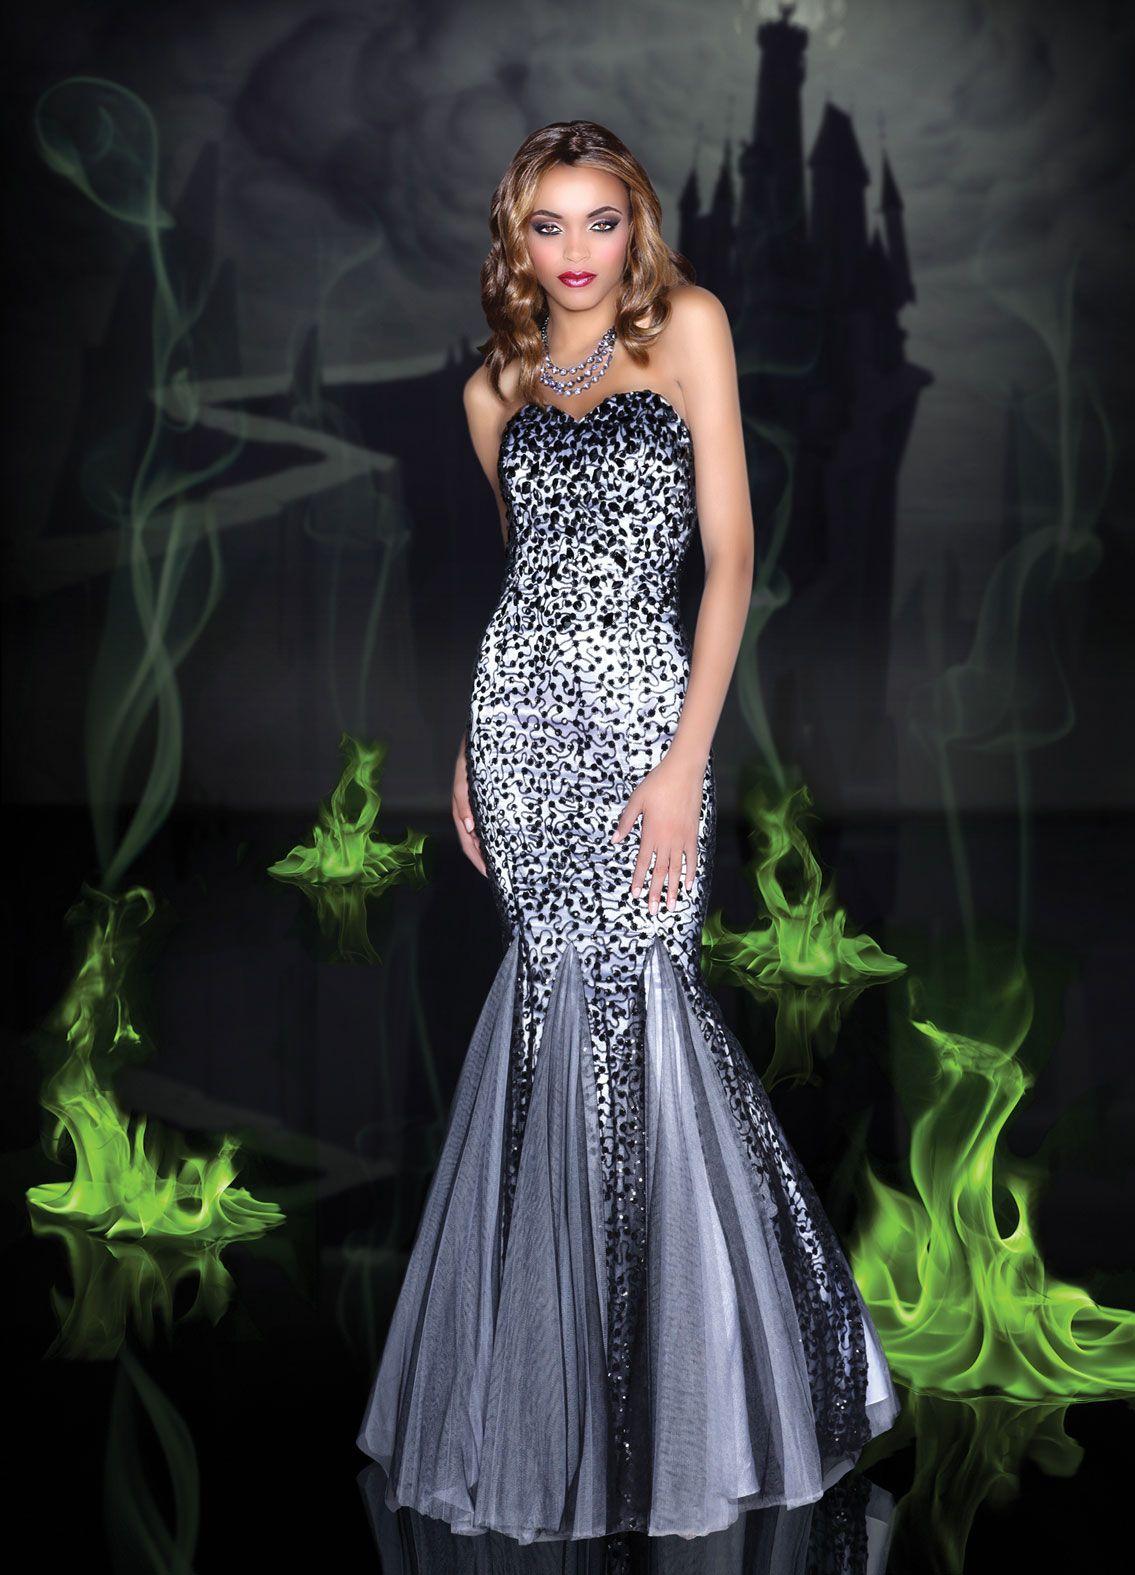 Disney forever enchanted prom dresses comes in auqua